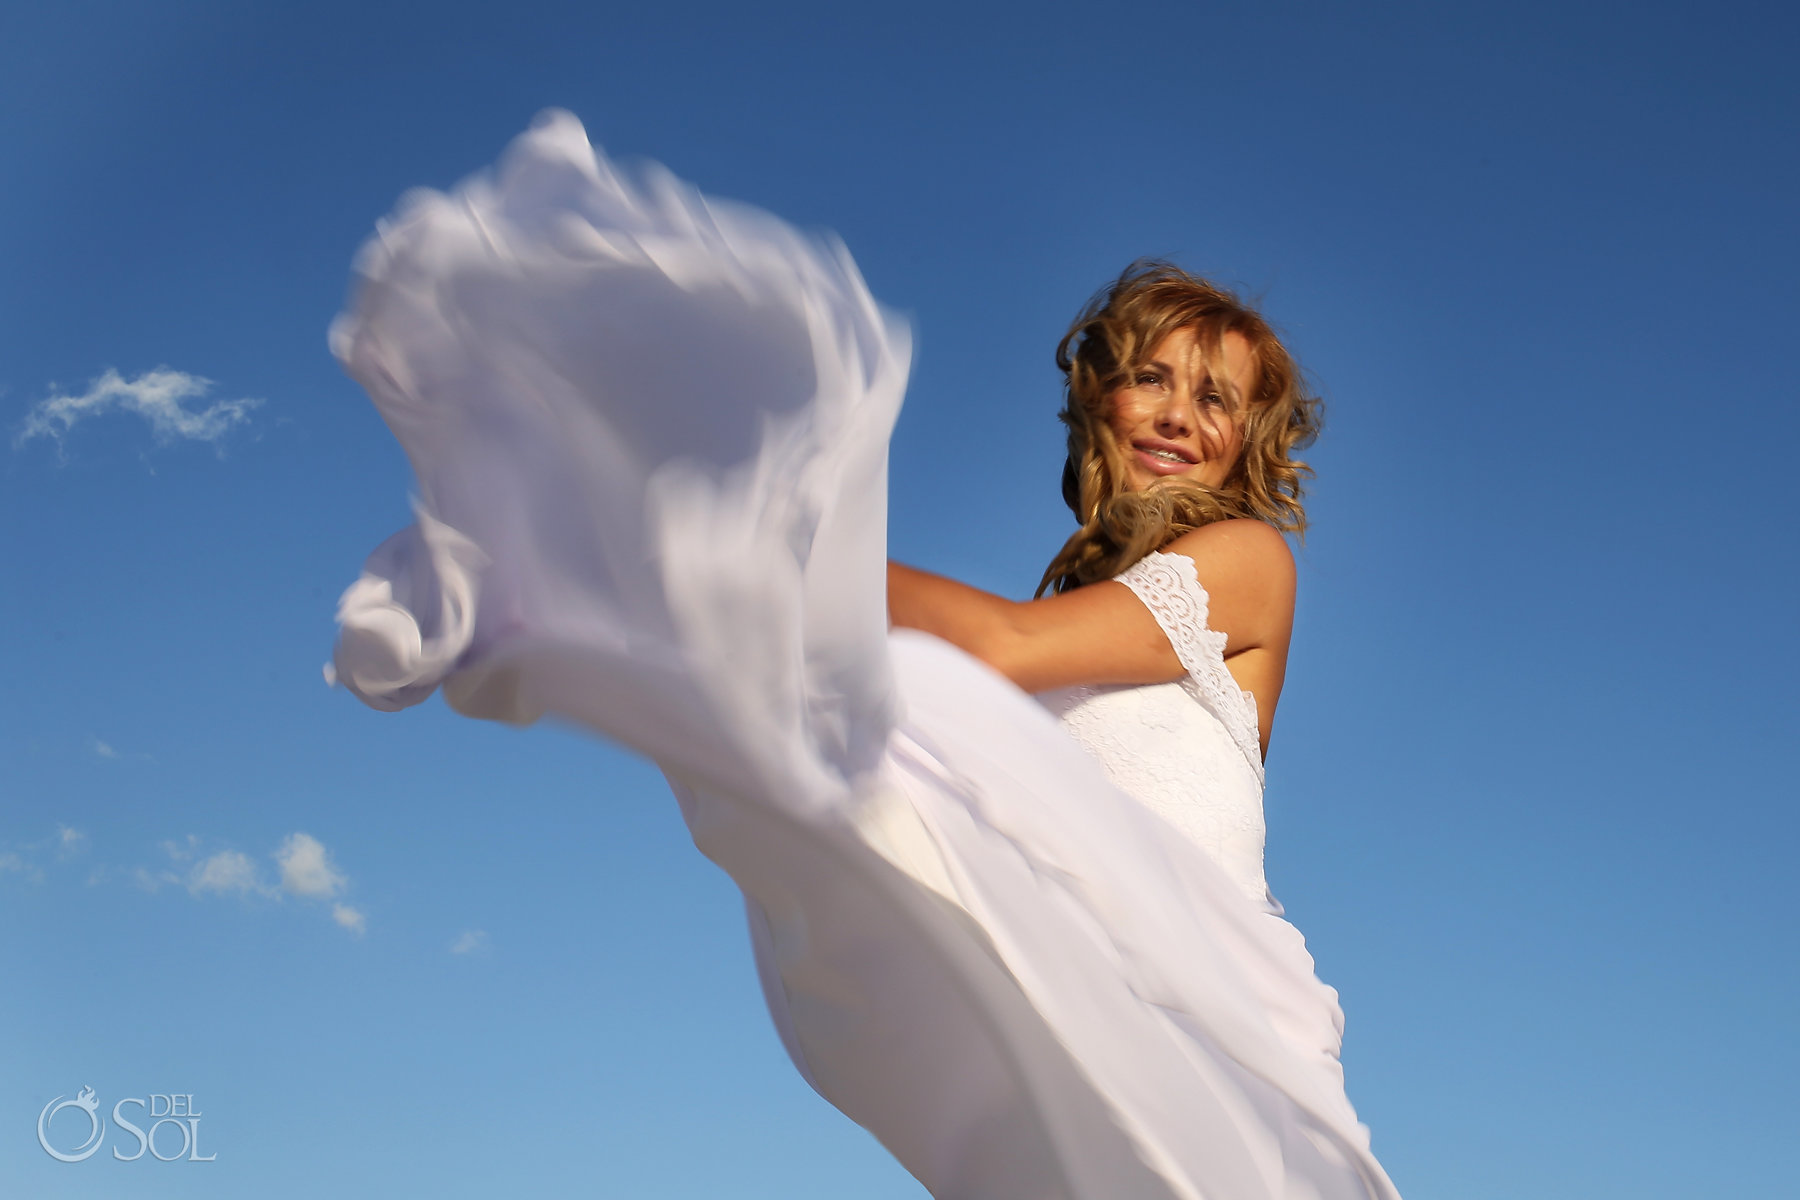 Polish Bridal Photoshoot Playing with her light dress